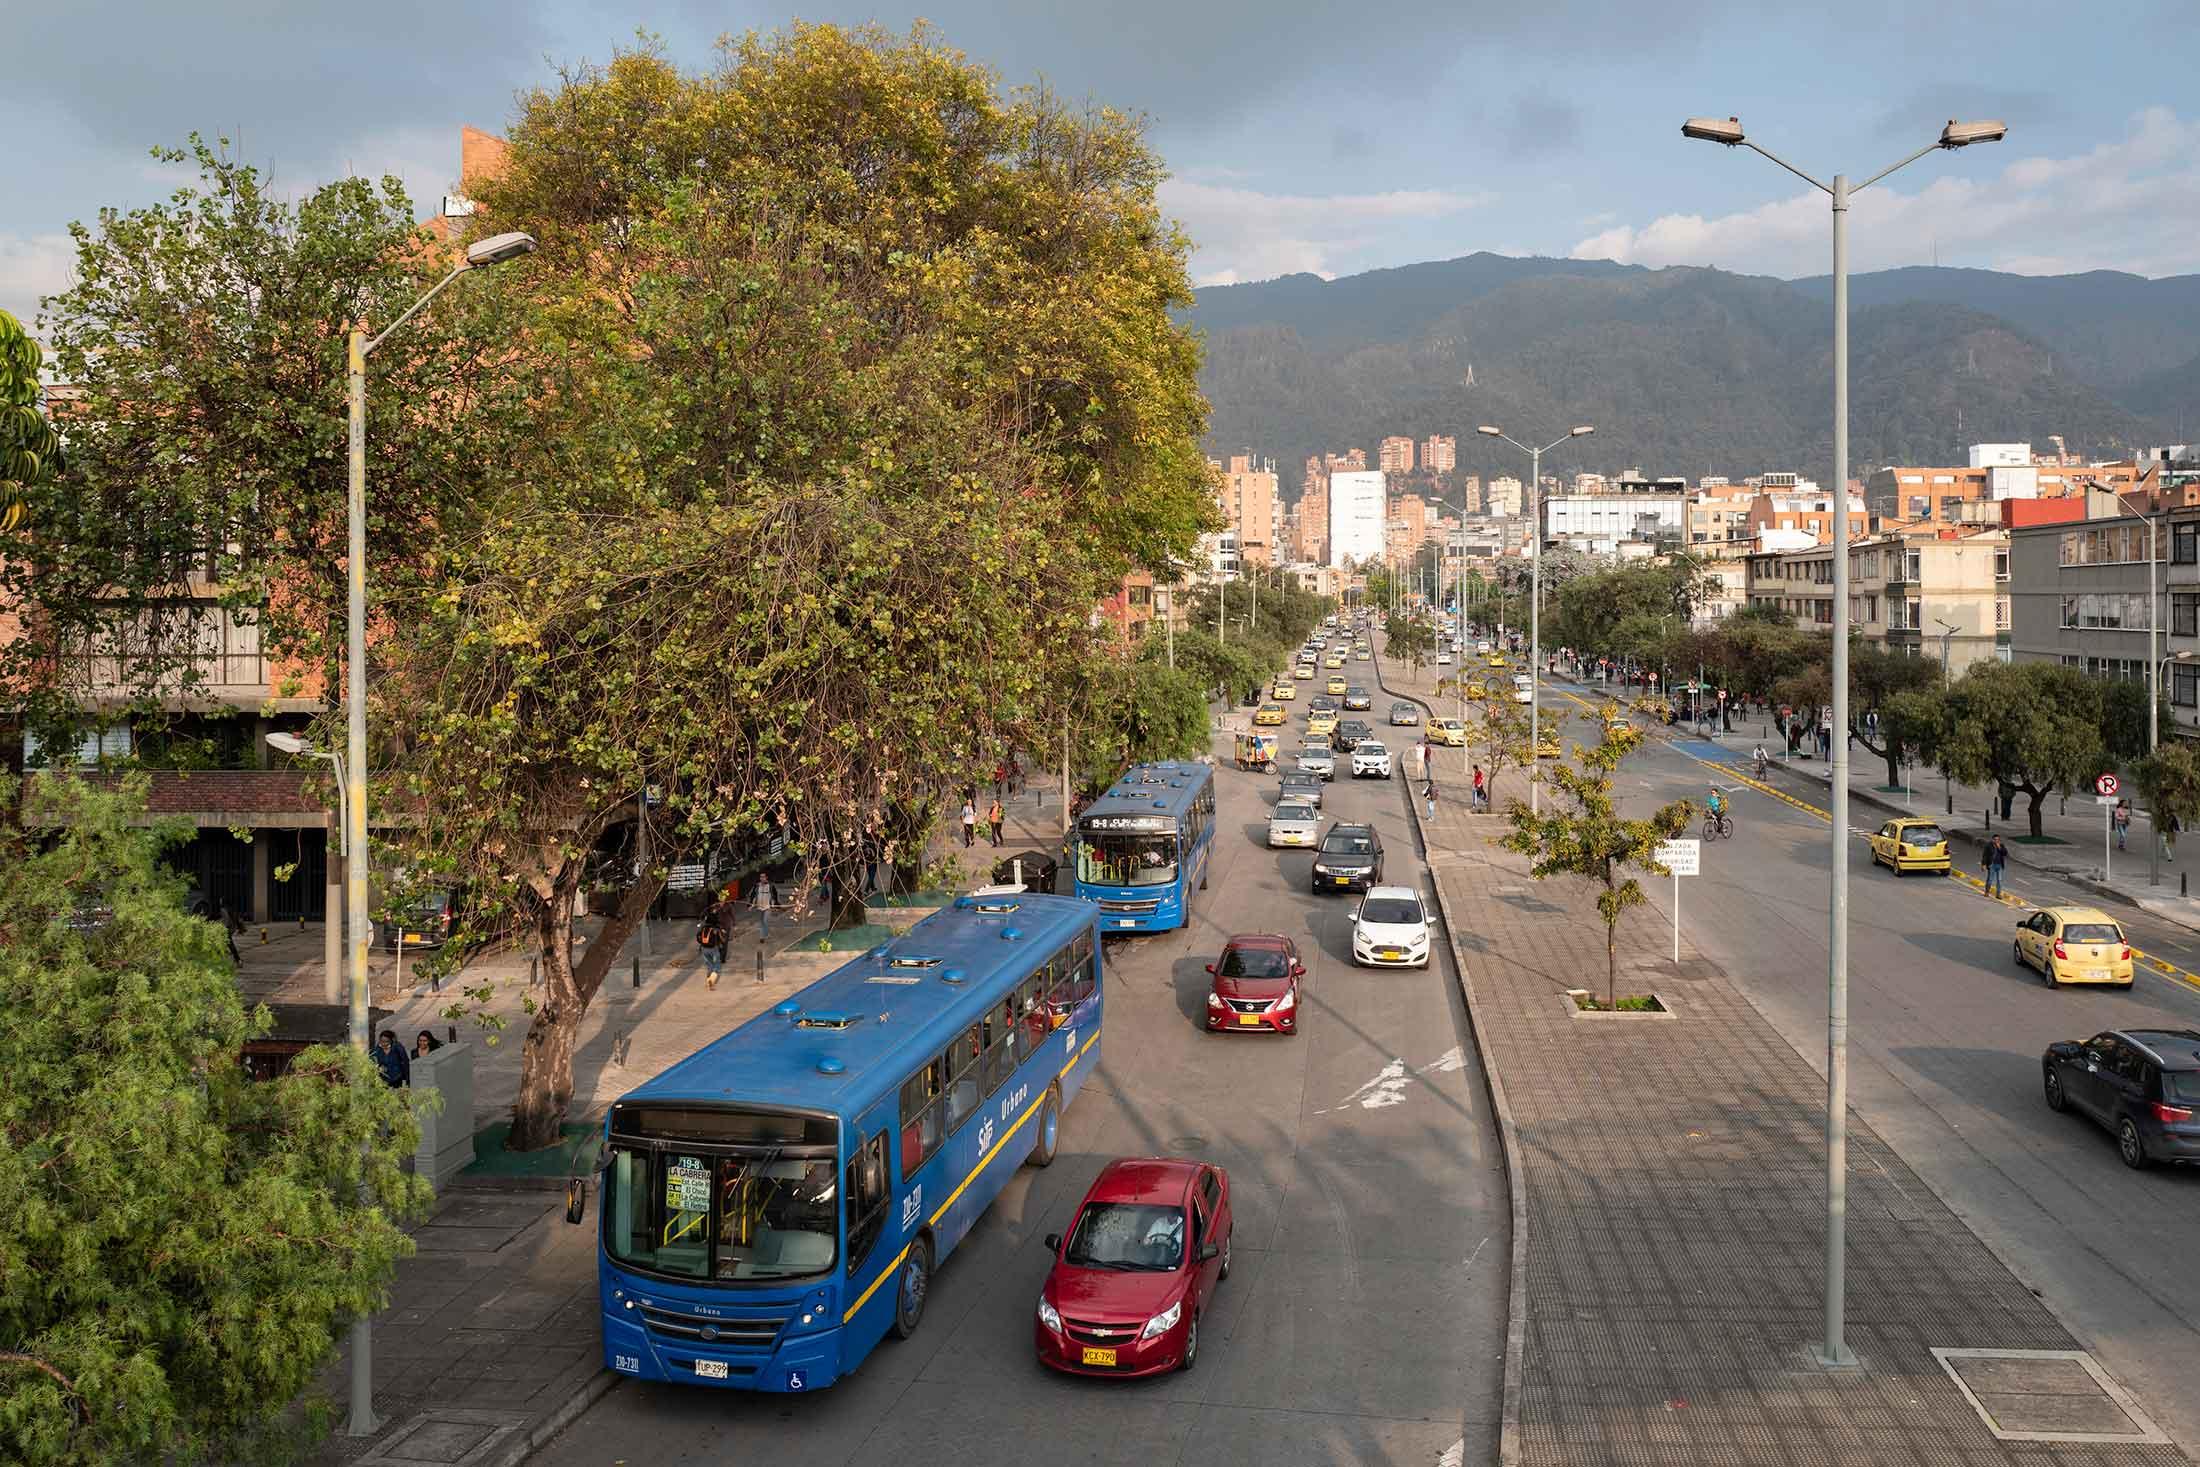 Mercenaries, Spies, and Double Agents Gather En Masse in Bogotá